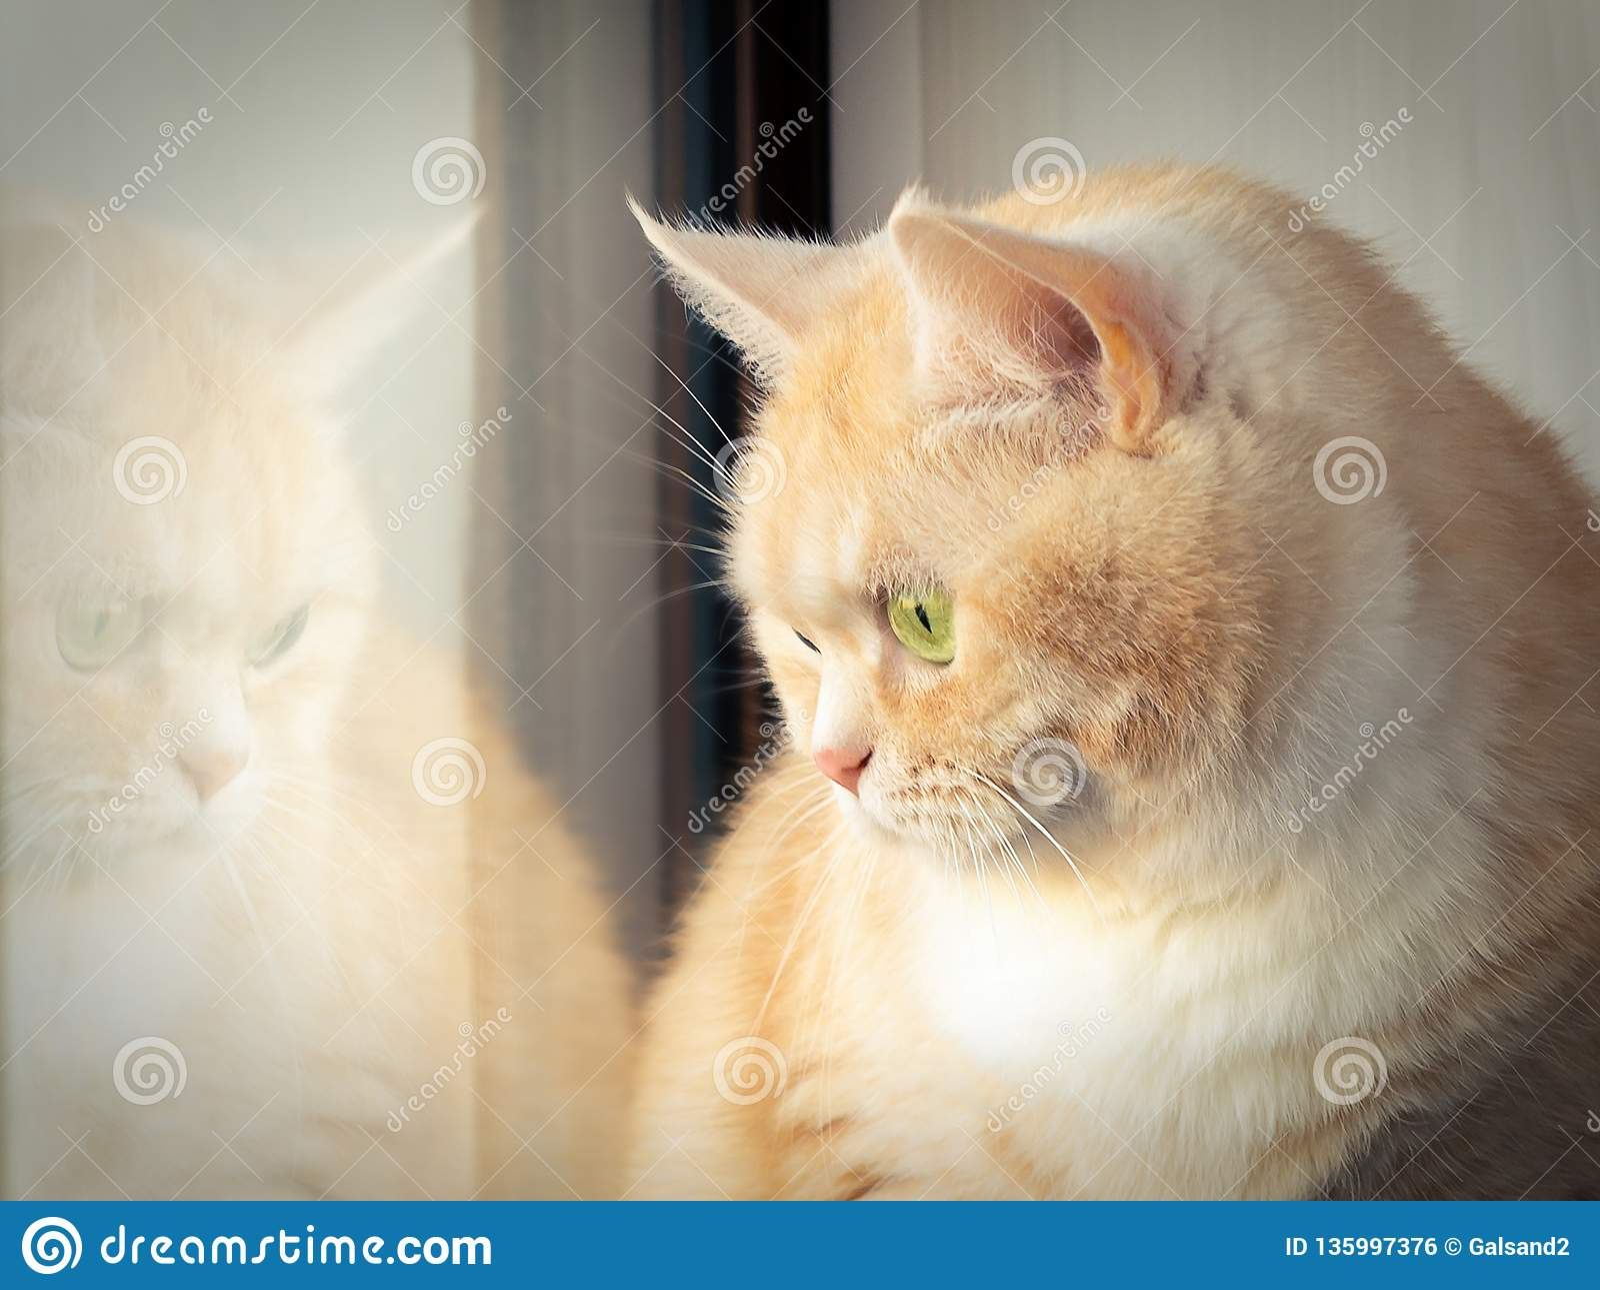 Beautiful sad creamy tabby cat sitting near the window